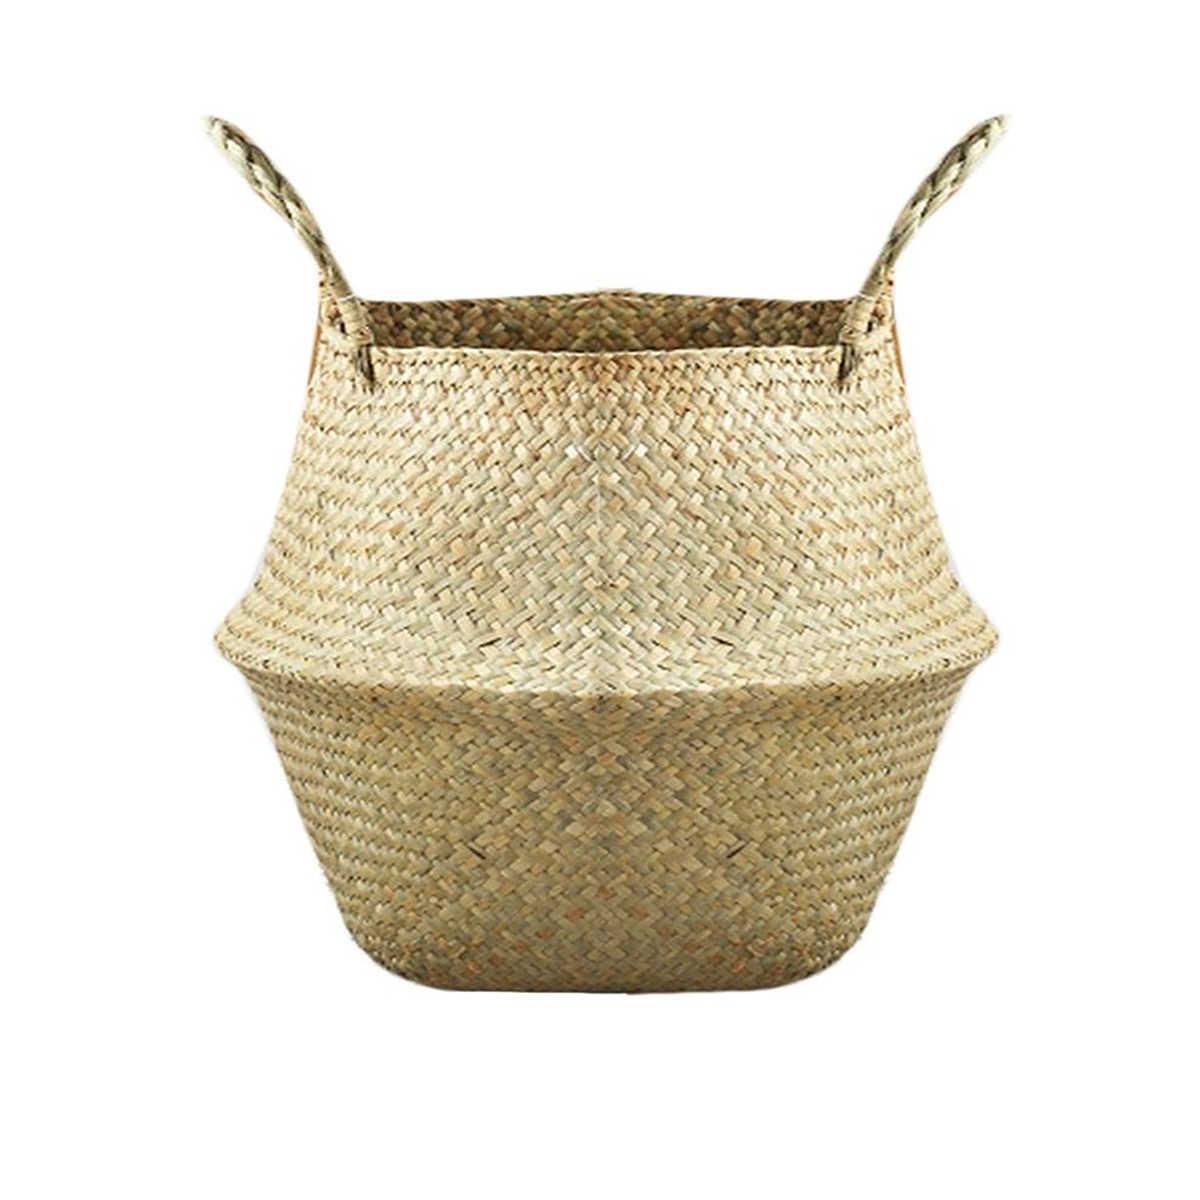 S/M/L/Rumah Tangga Lipat Rumput Laut Alami Woven Penyimpanan Taman Pot Vas Bunga Gantung Keranjang Penyimpanan Keranjang Rumah dekorasi